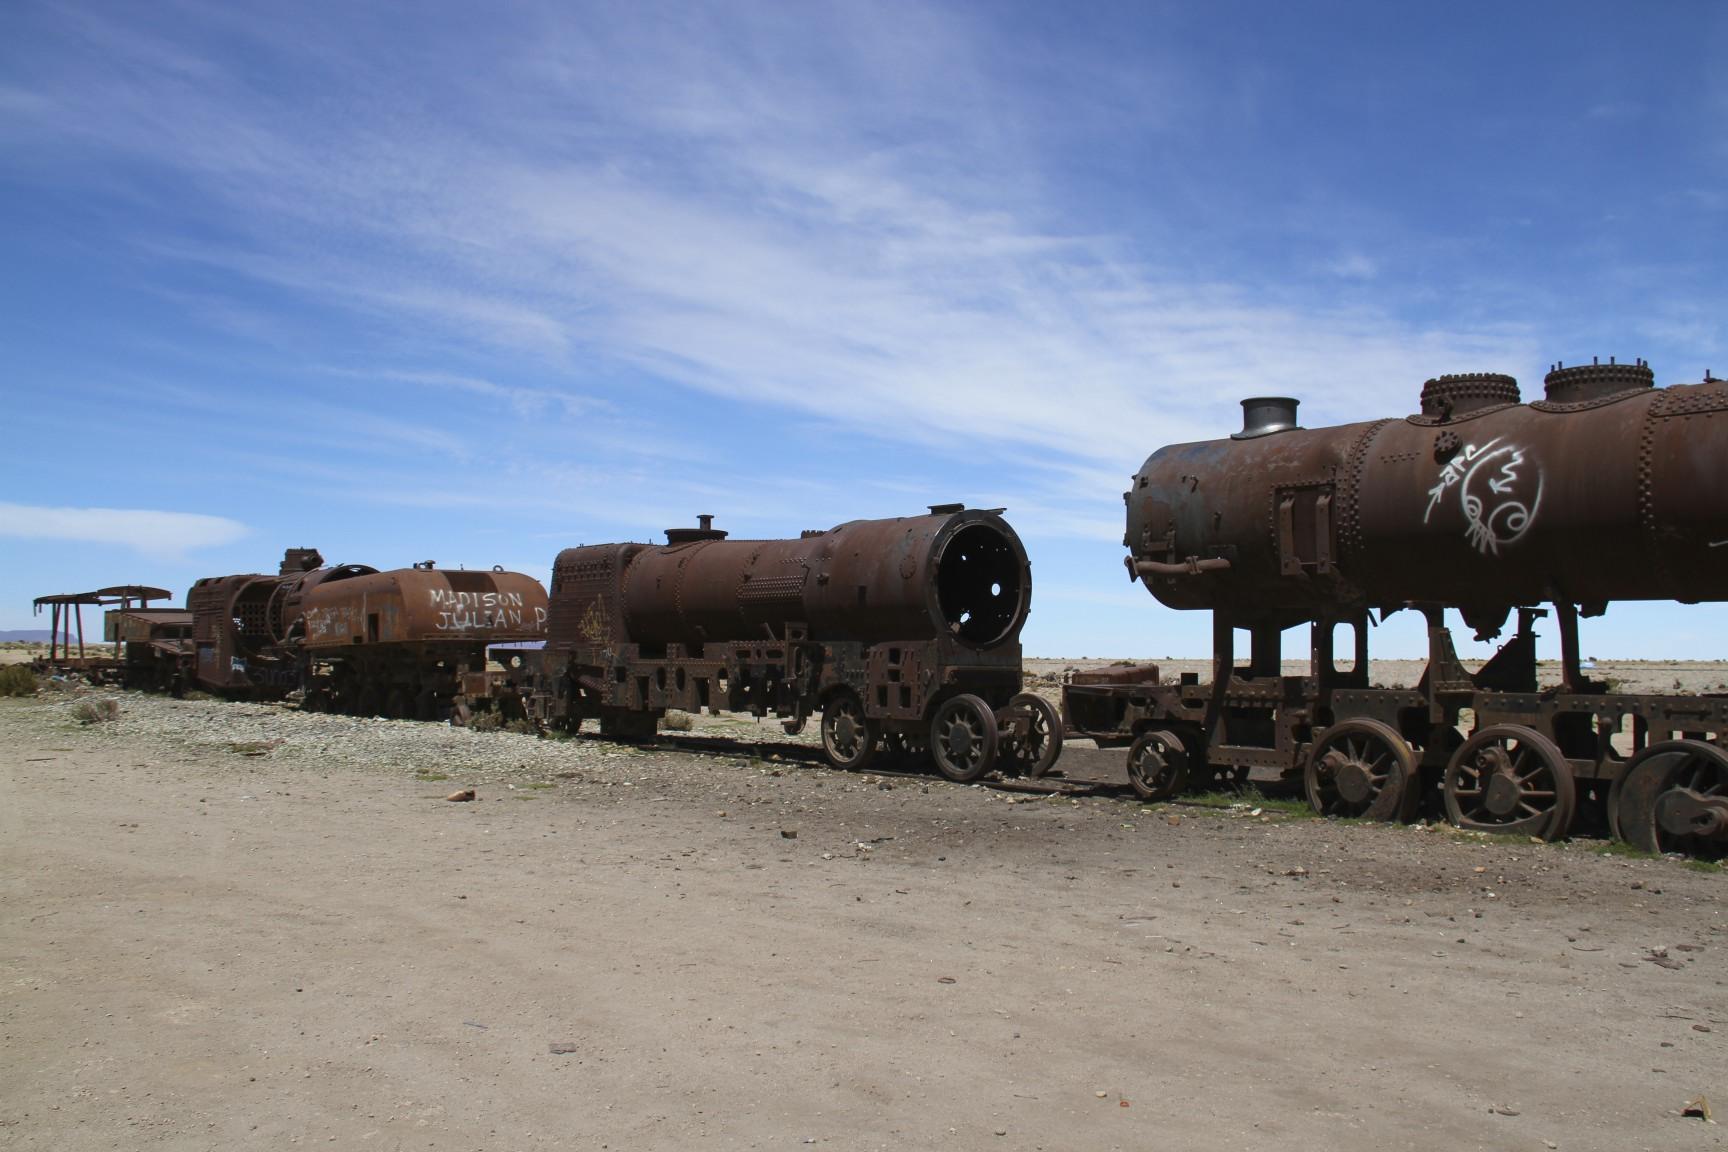 Where Trains Go To Rust Uyunis Train Cemetery on Sight Word Am